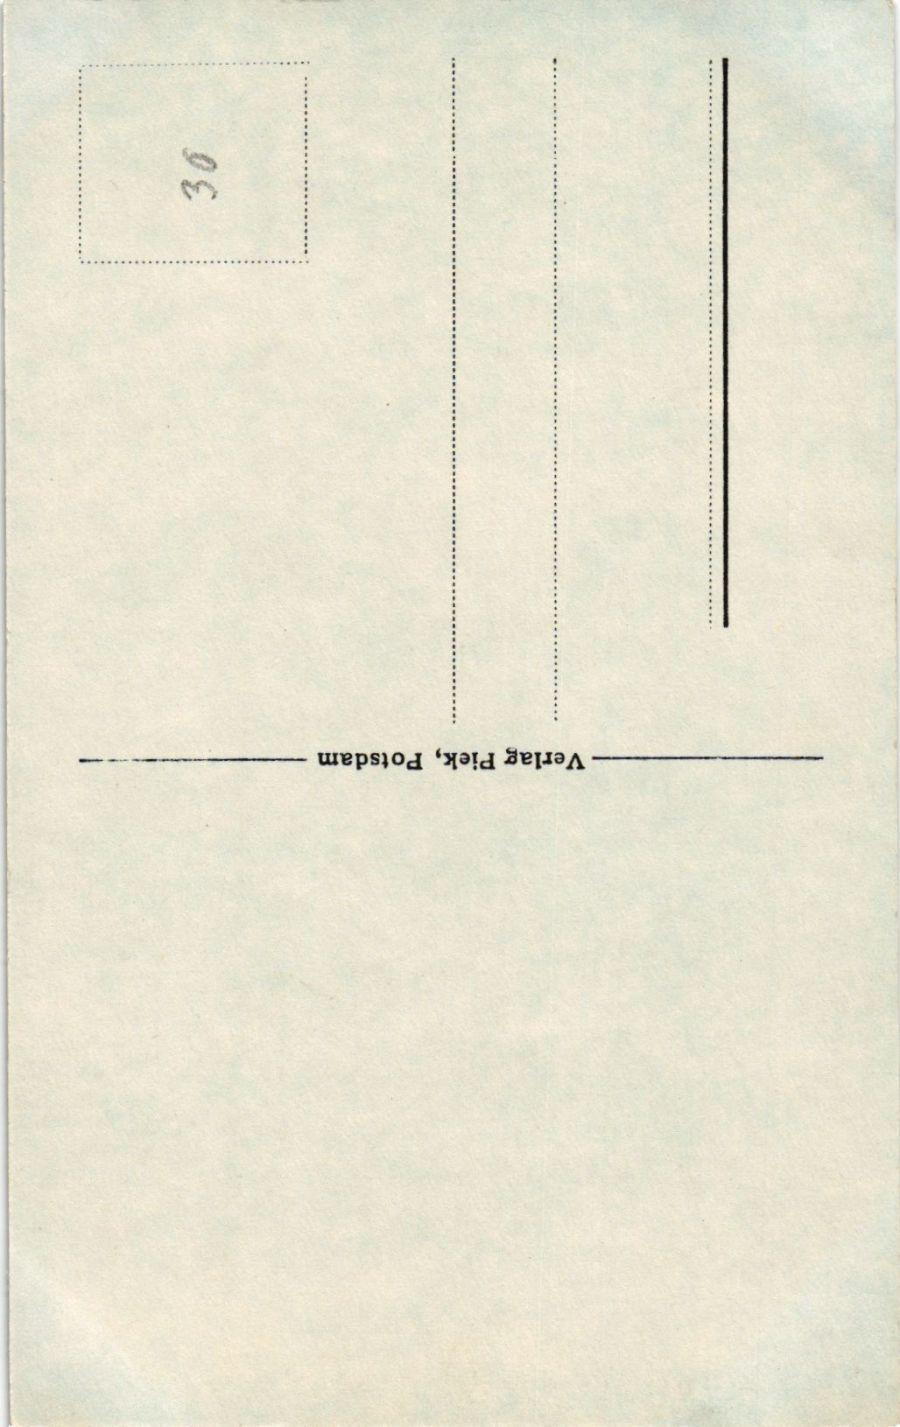 CPA-AK-Prinz-Wilhelm-Karl-v-Preussen-GERMAN-ROYALTY-867646 Indexbild 2